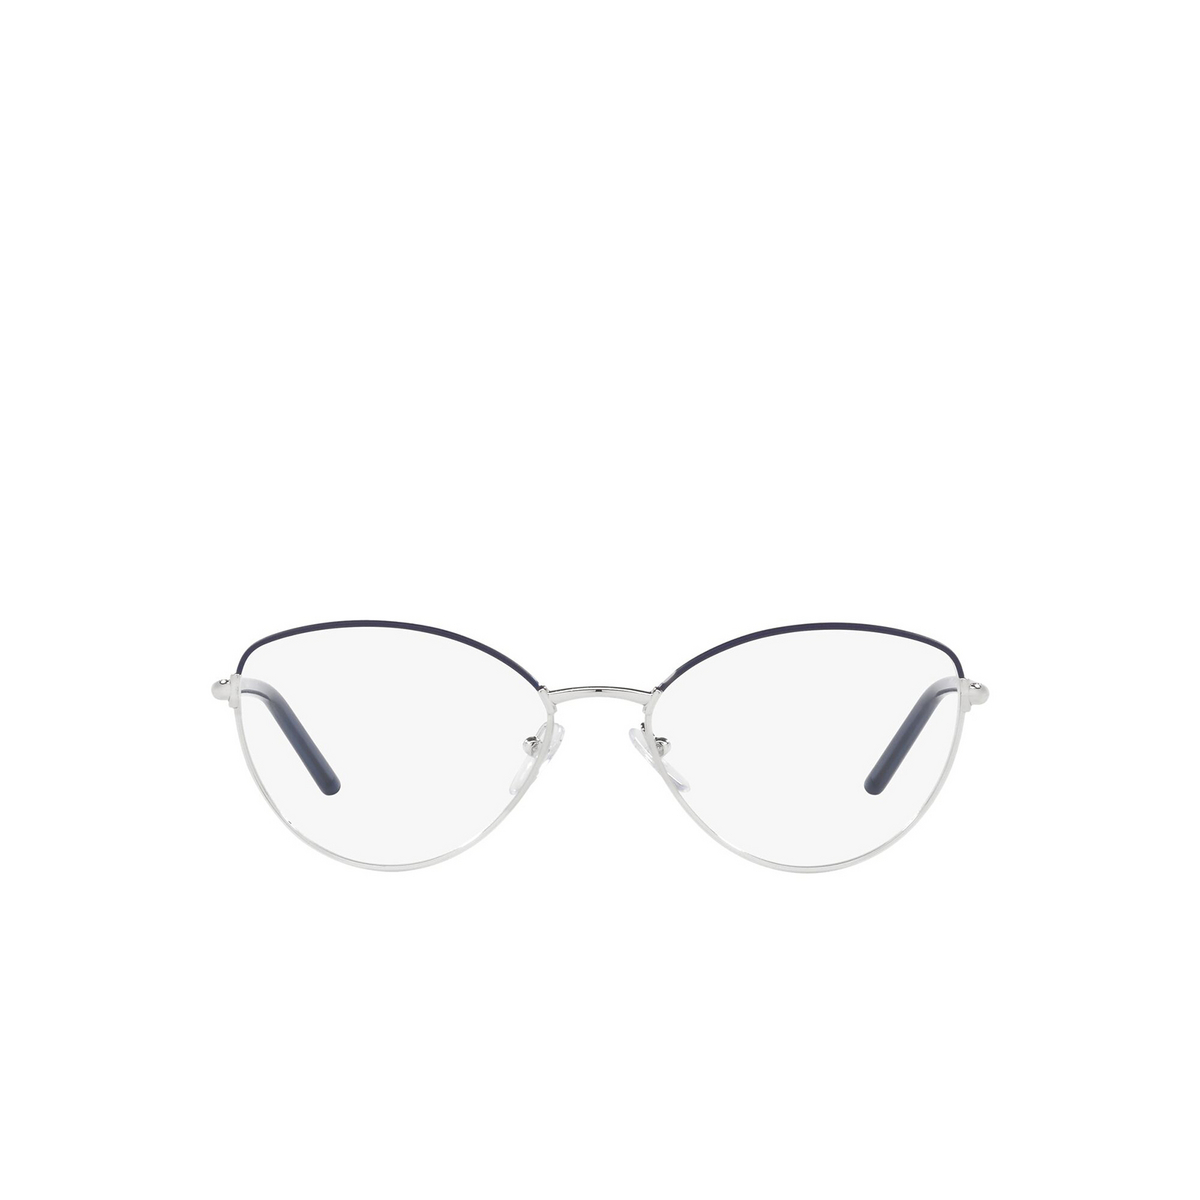 Prada® Butterfly Eyeglasses: PR 62WV color Bluette / Silver 09R1O1 - front view.